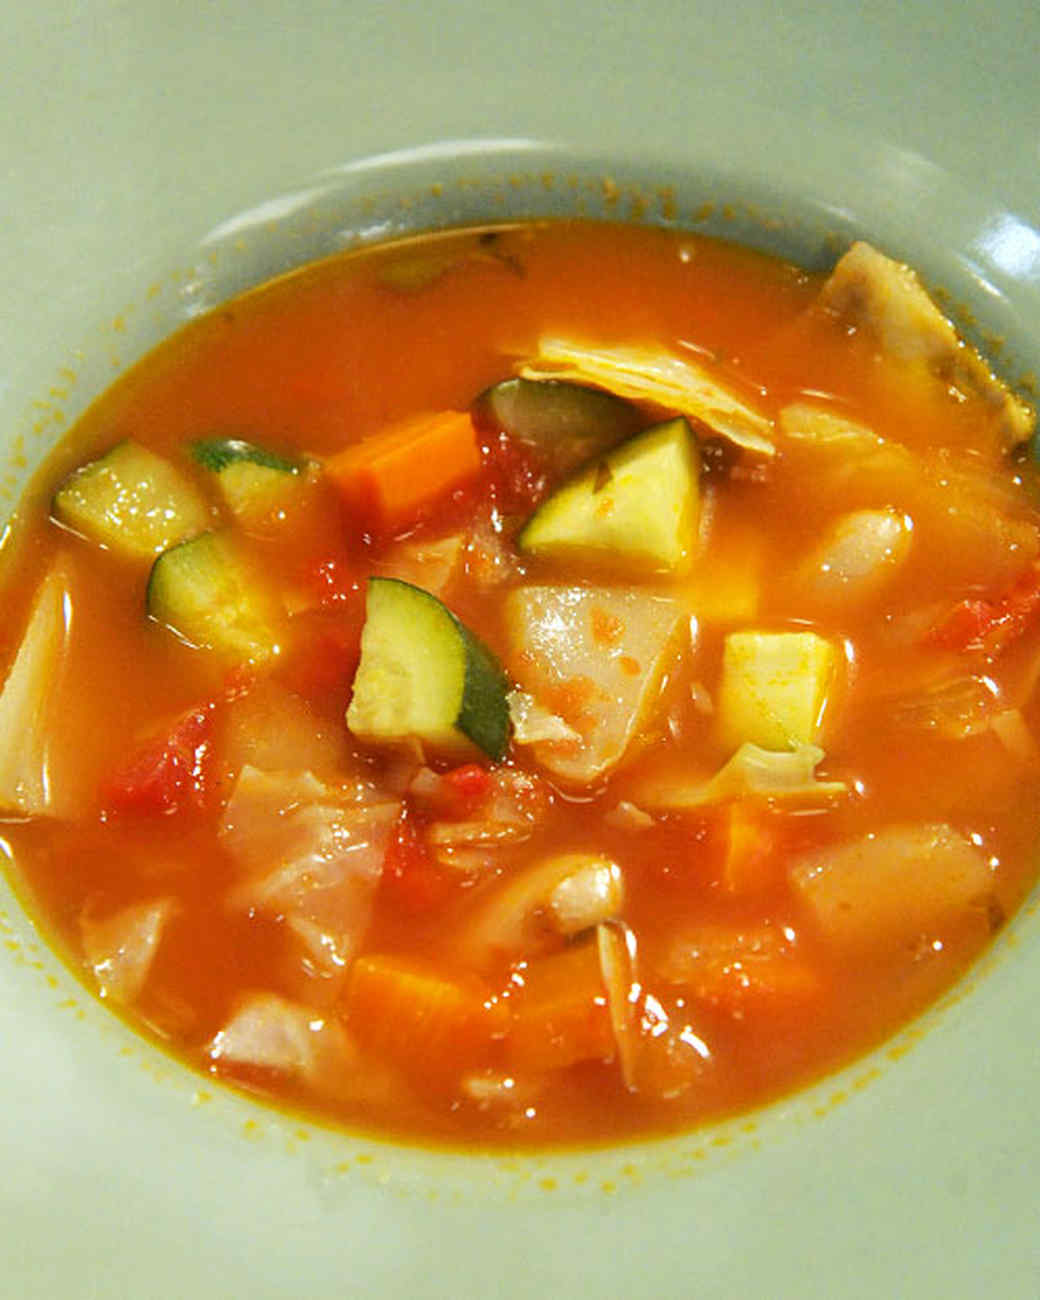 6086_012411_soup.jpg